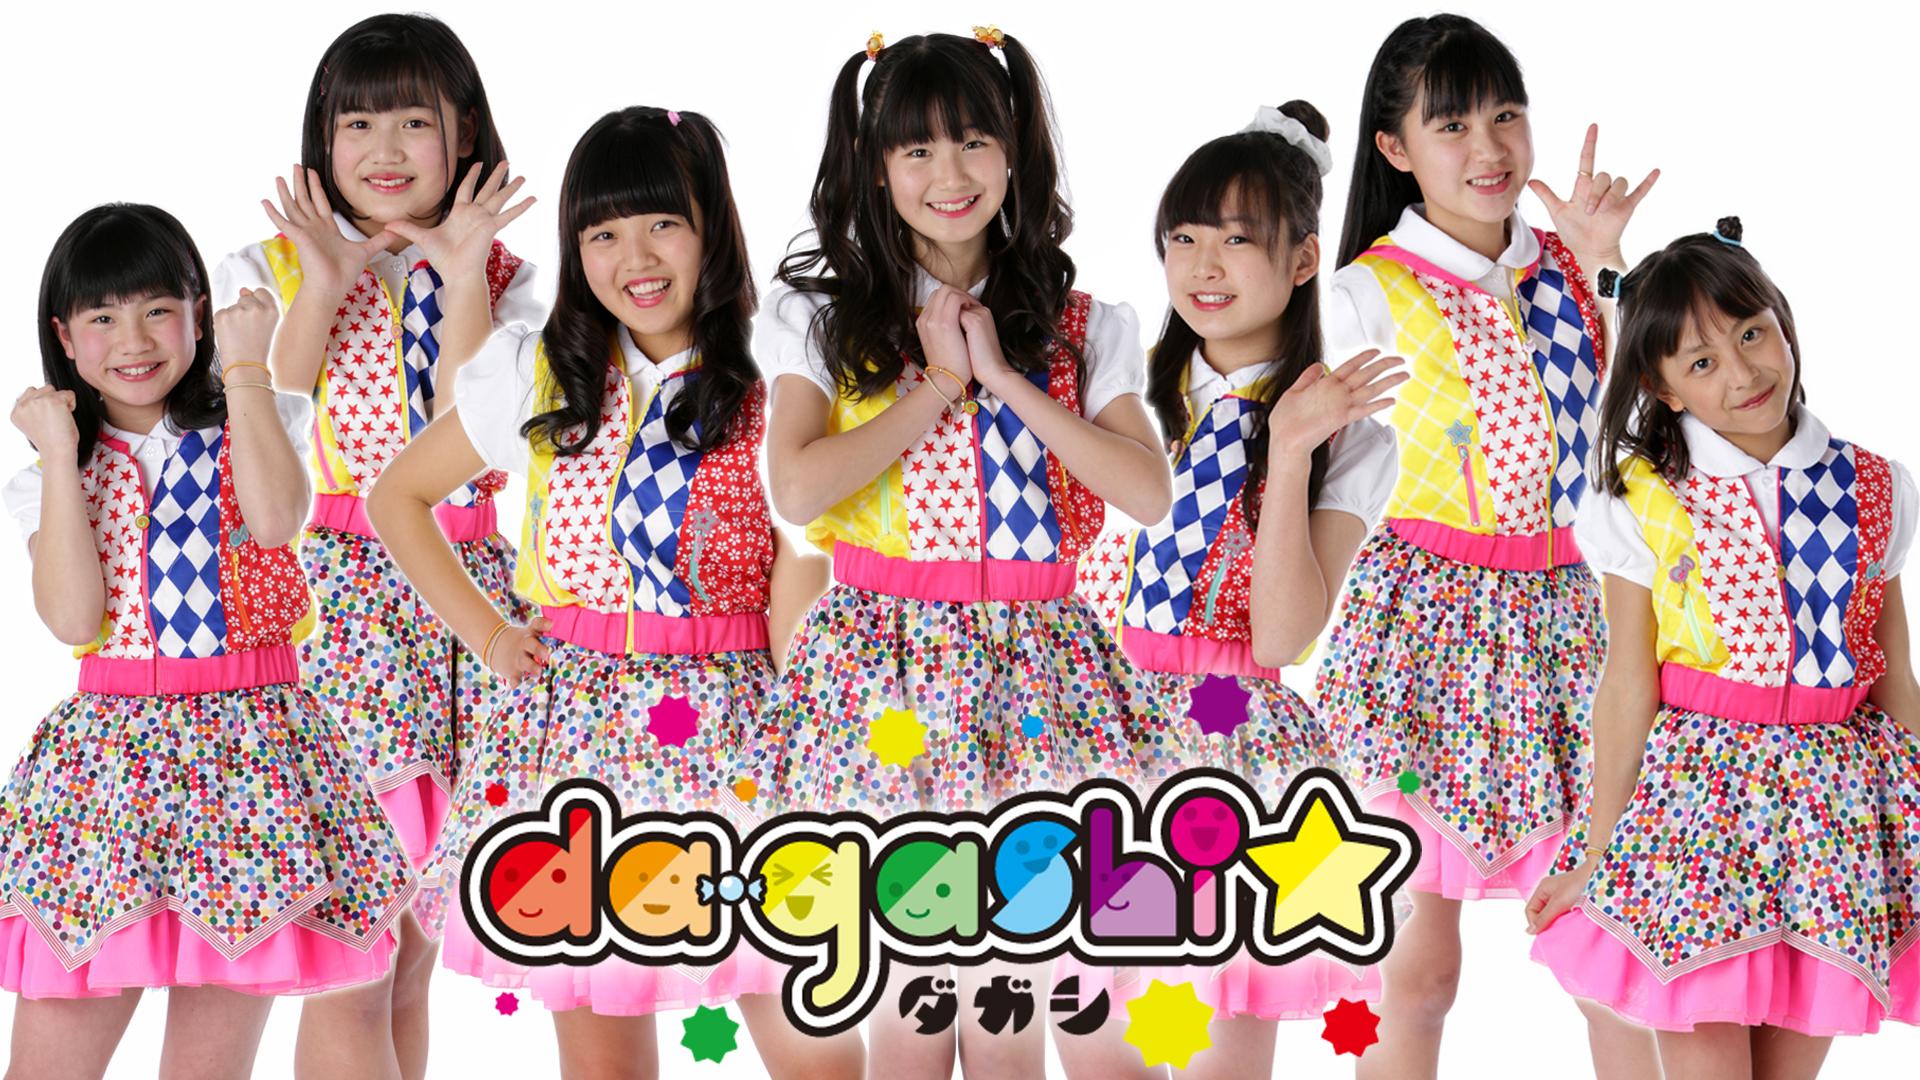 【da-gashi☆】ライブ活動について